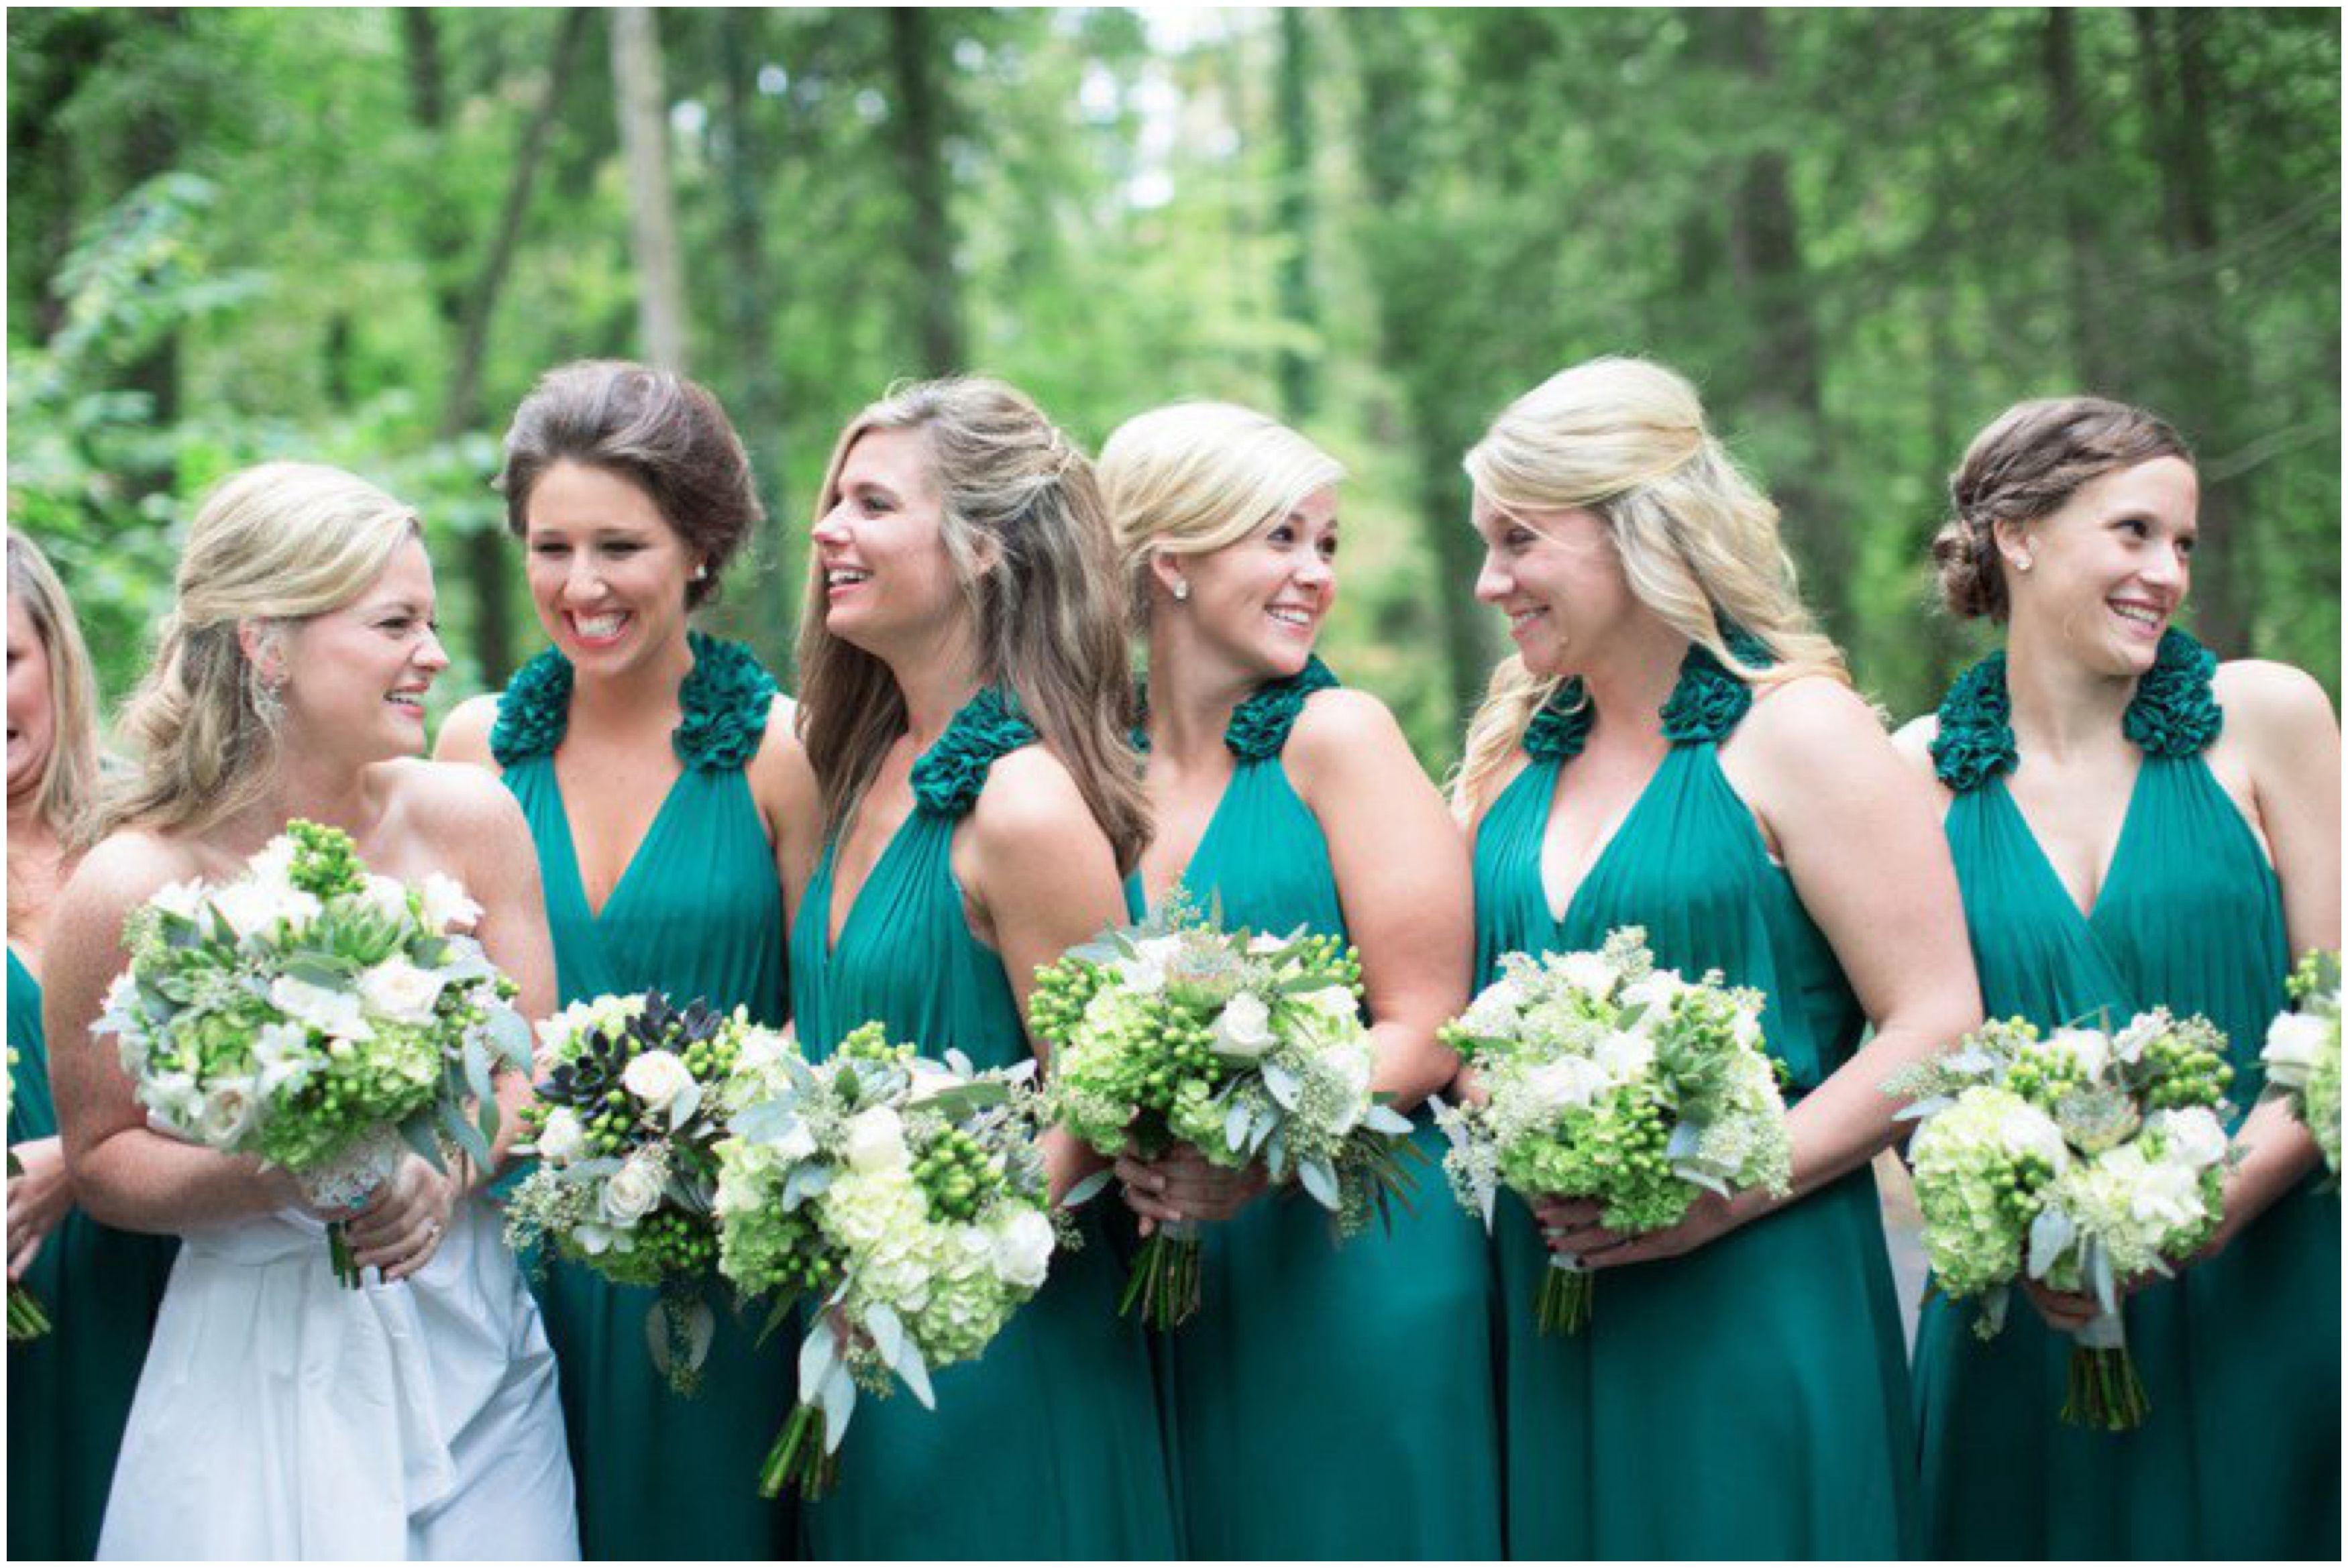 Bridesmaid Green dresses for fresher spring wedding